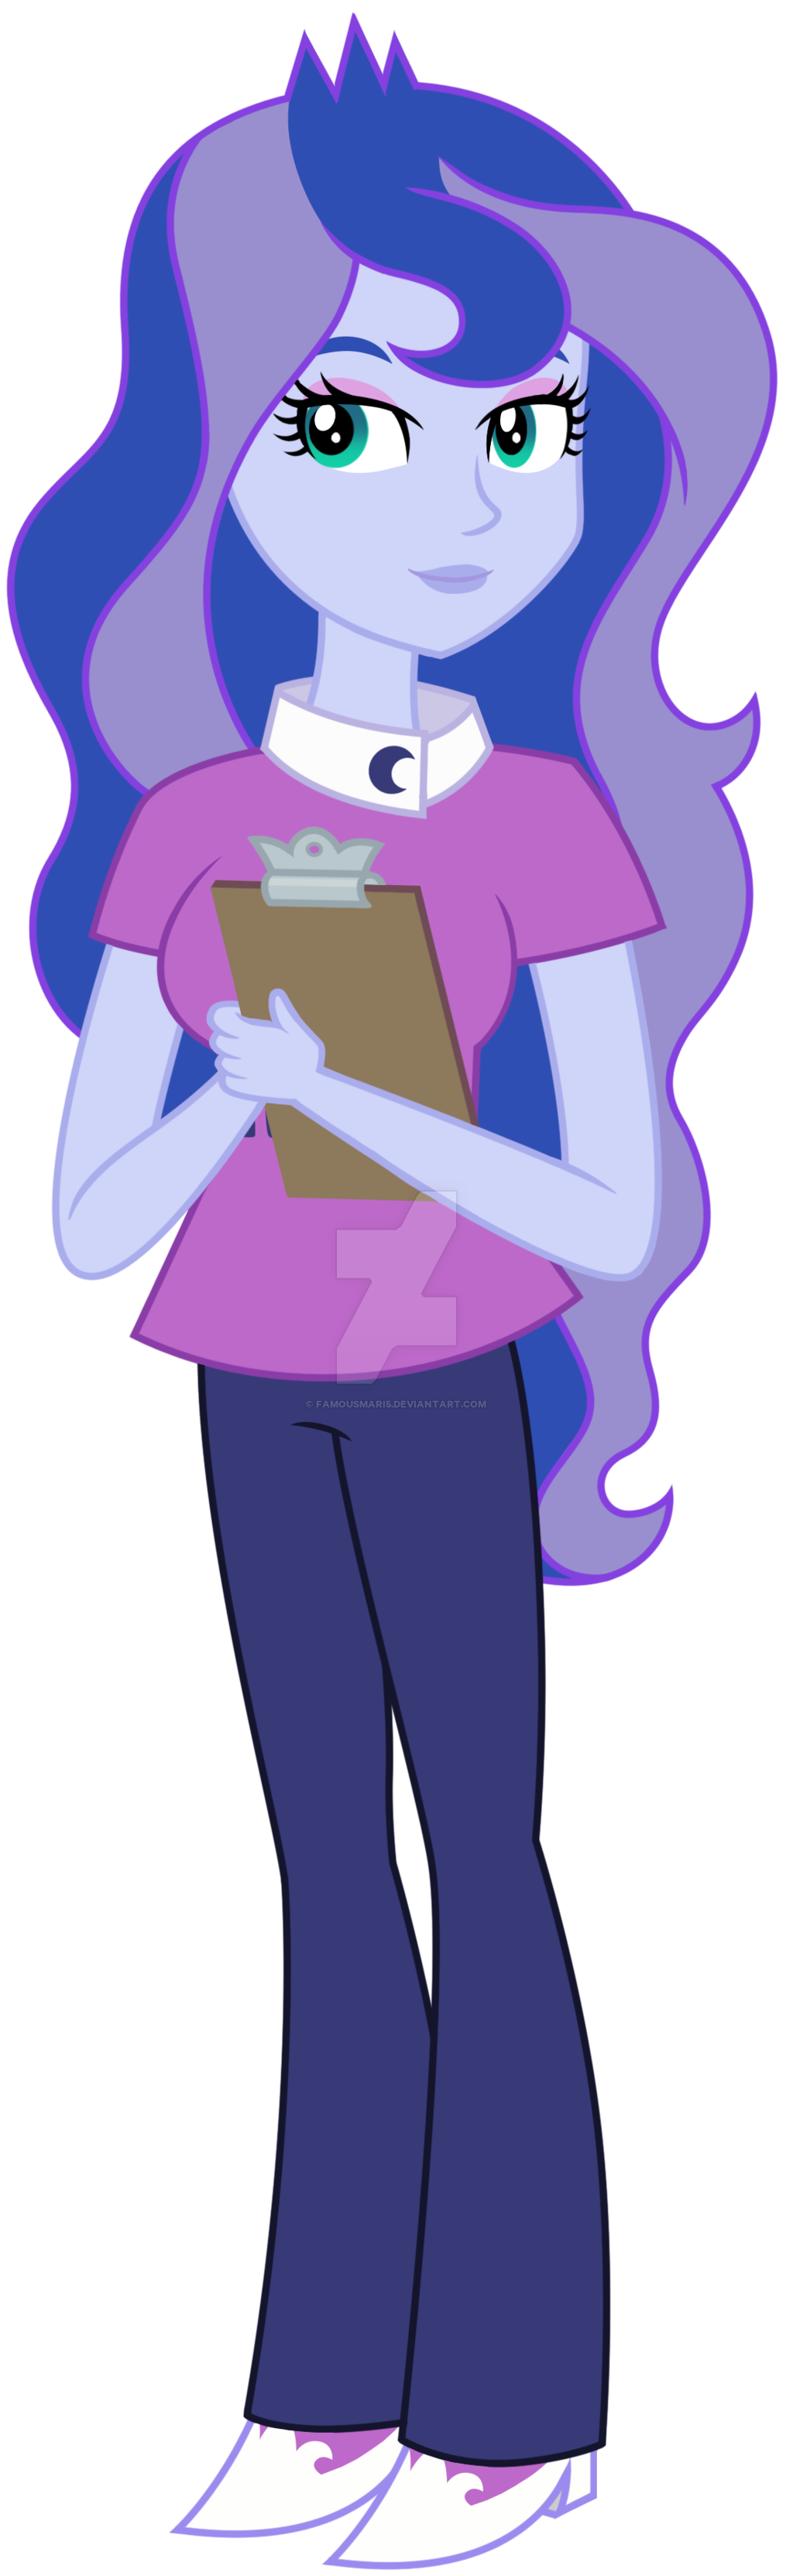 Luna by famousmari on. Working clipart vice principal